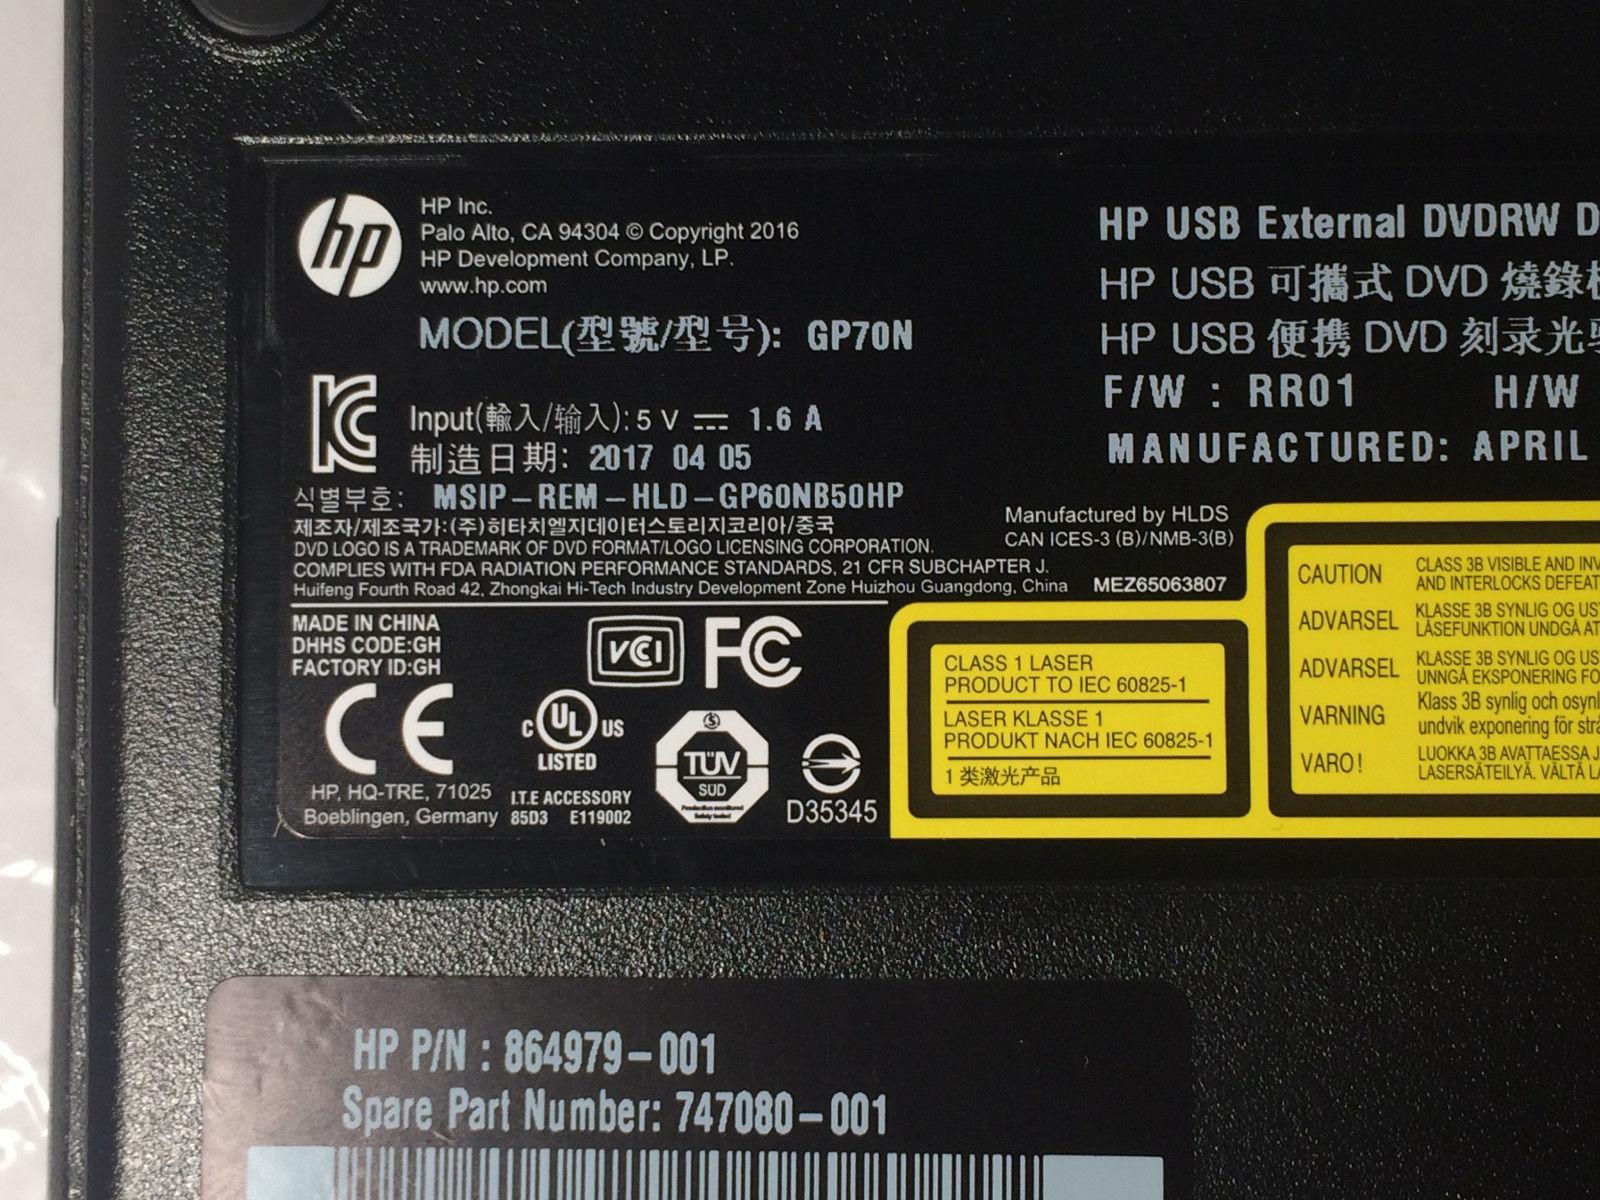 HP GP70N DVD+/-RW USB Slim DVDRW external Drive 754895-001 747080-001 New Other